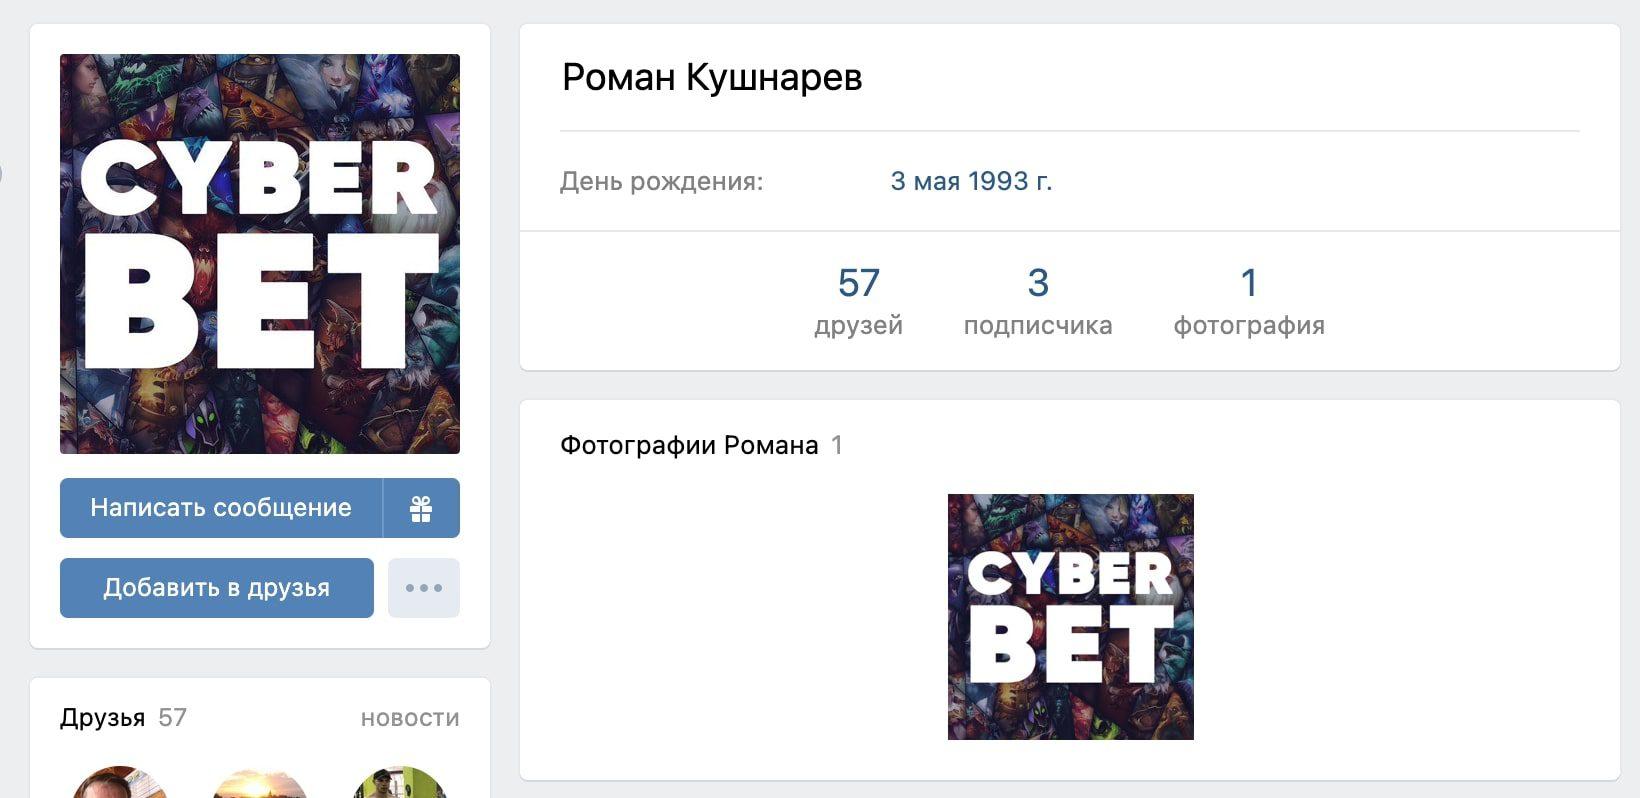 Страница админа каппера Cyberbet (Cyber bet)